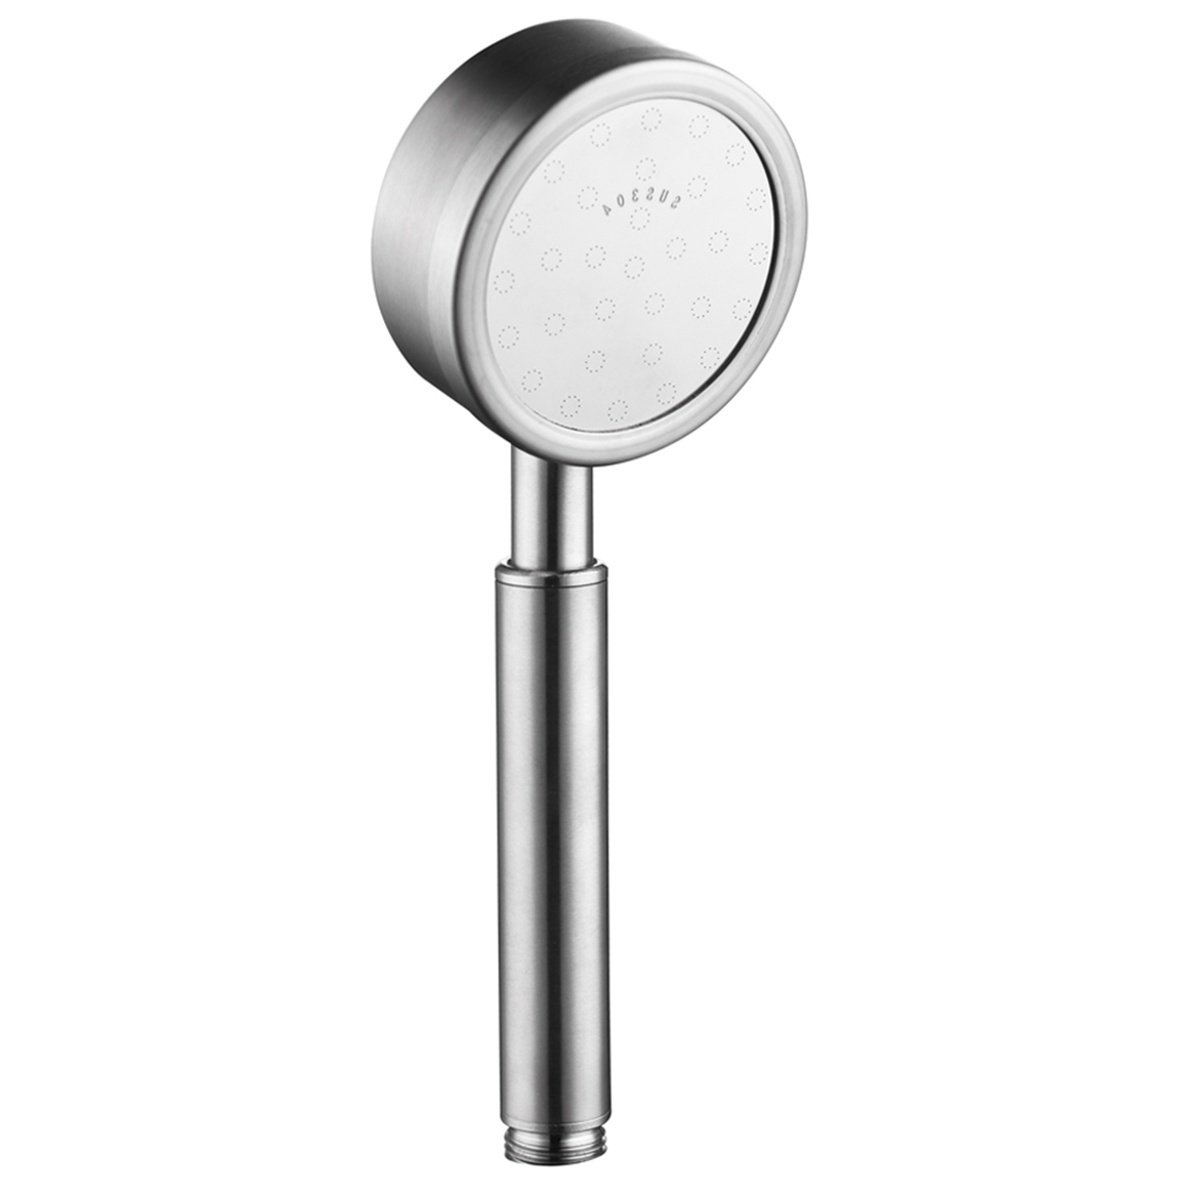 Ciencia 304 Stainless Steel Shower Head High Pressure Handheld Showerhead Nickel, Hand Shower Head Only, BS141A